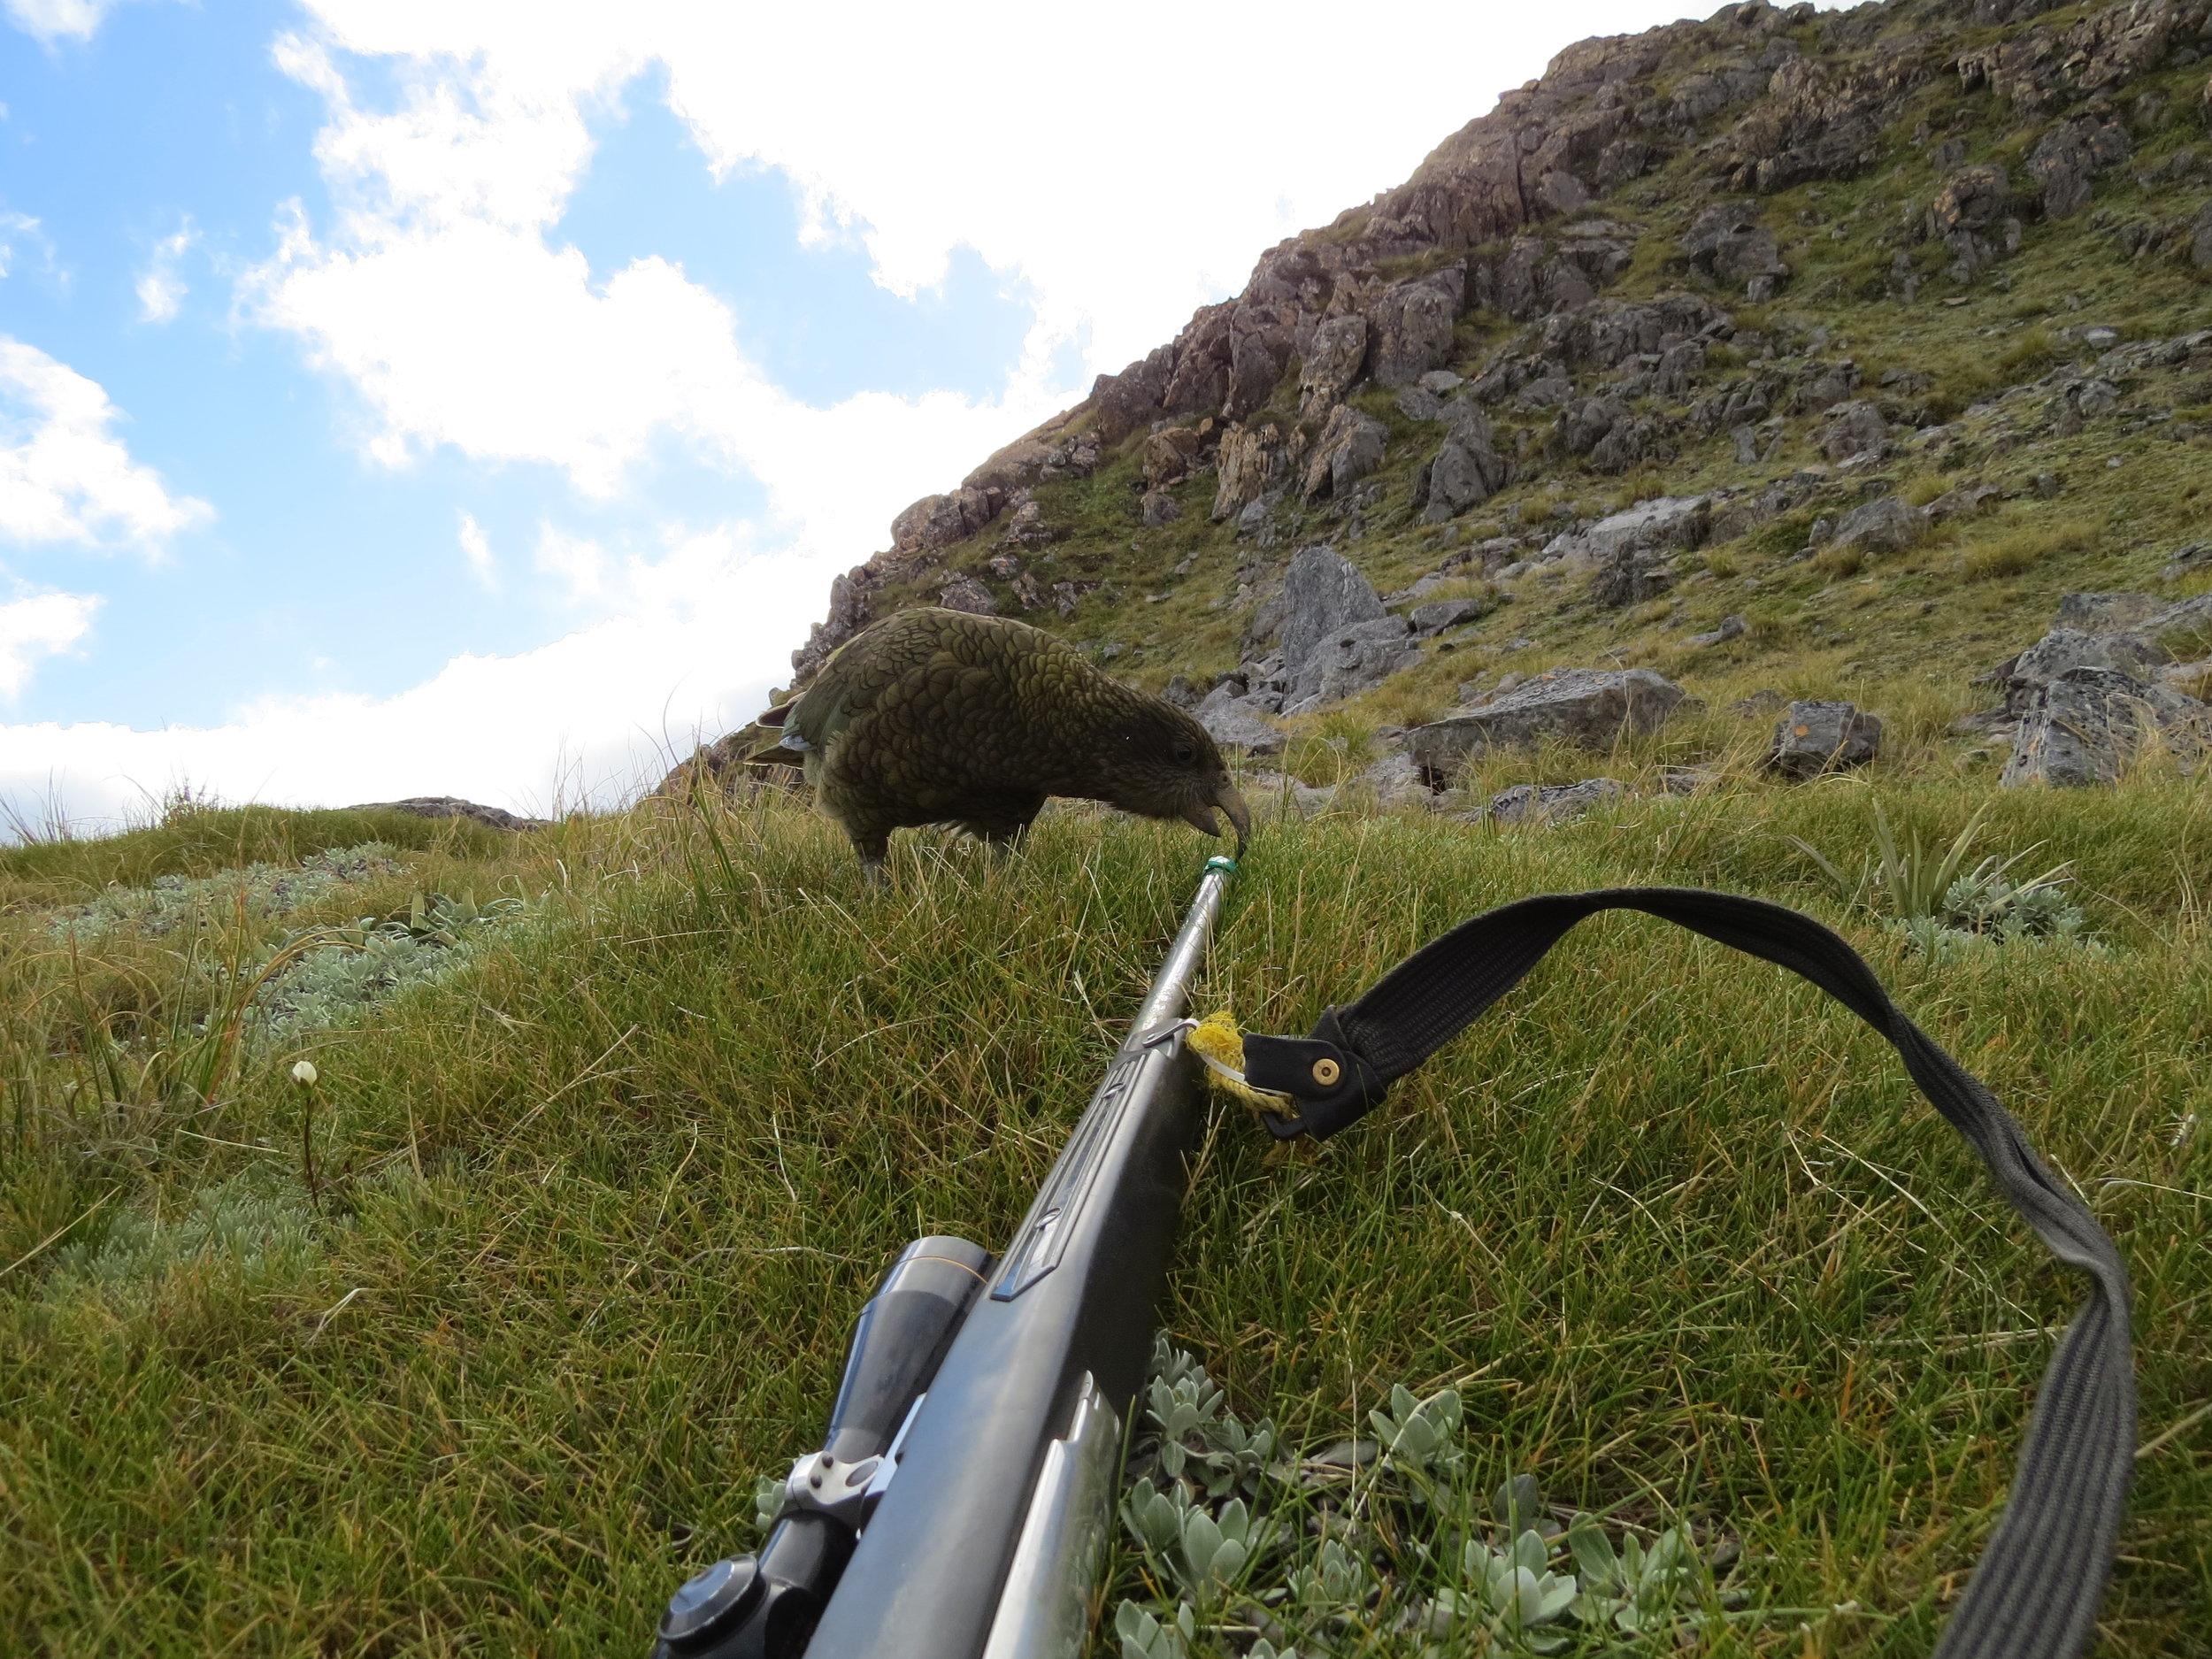 The cheeky kea, always entertaining.